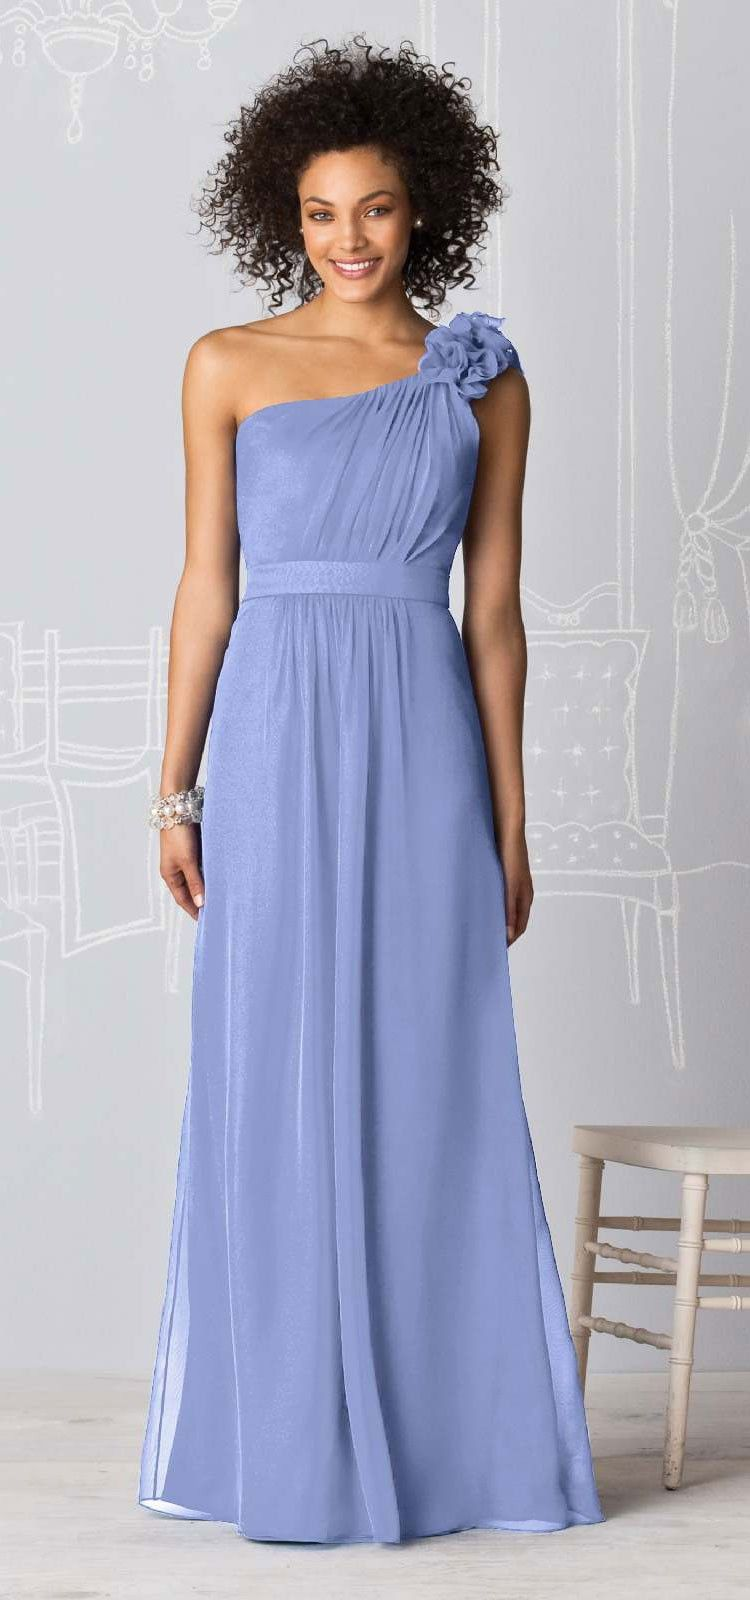 Periwinkle bridesmaid dress periwinkle wedding for Dusky pink wedding dress